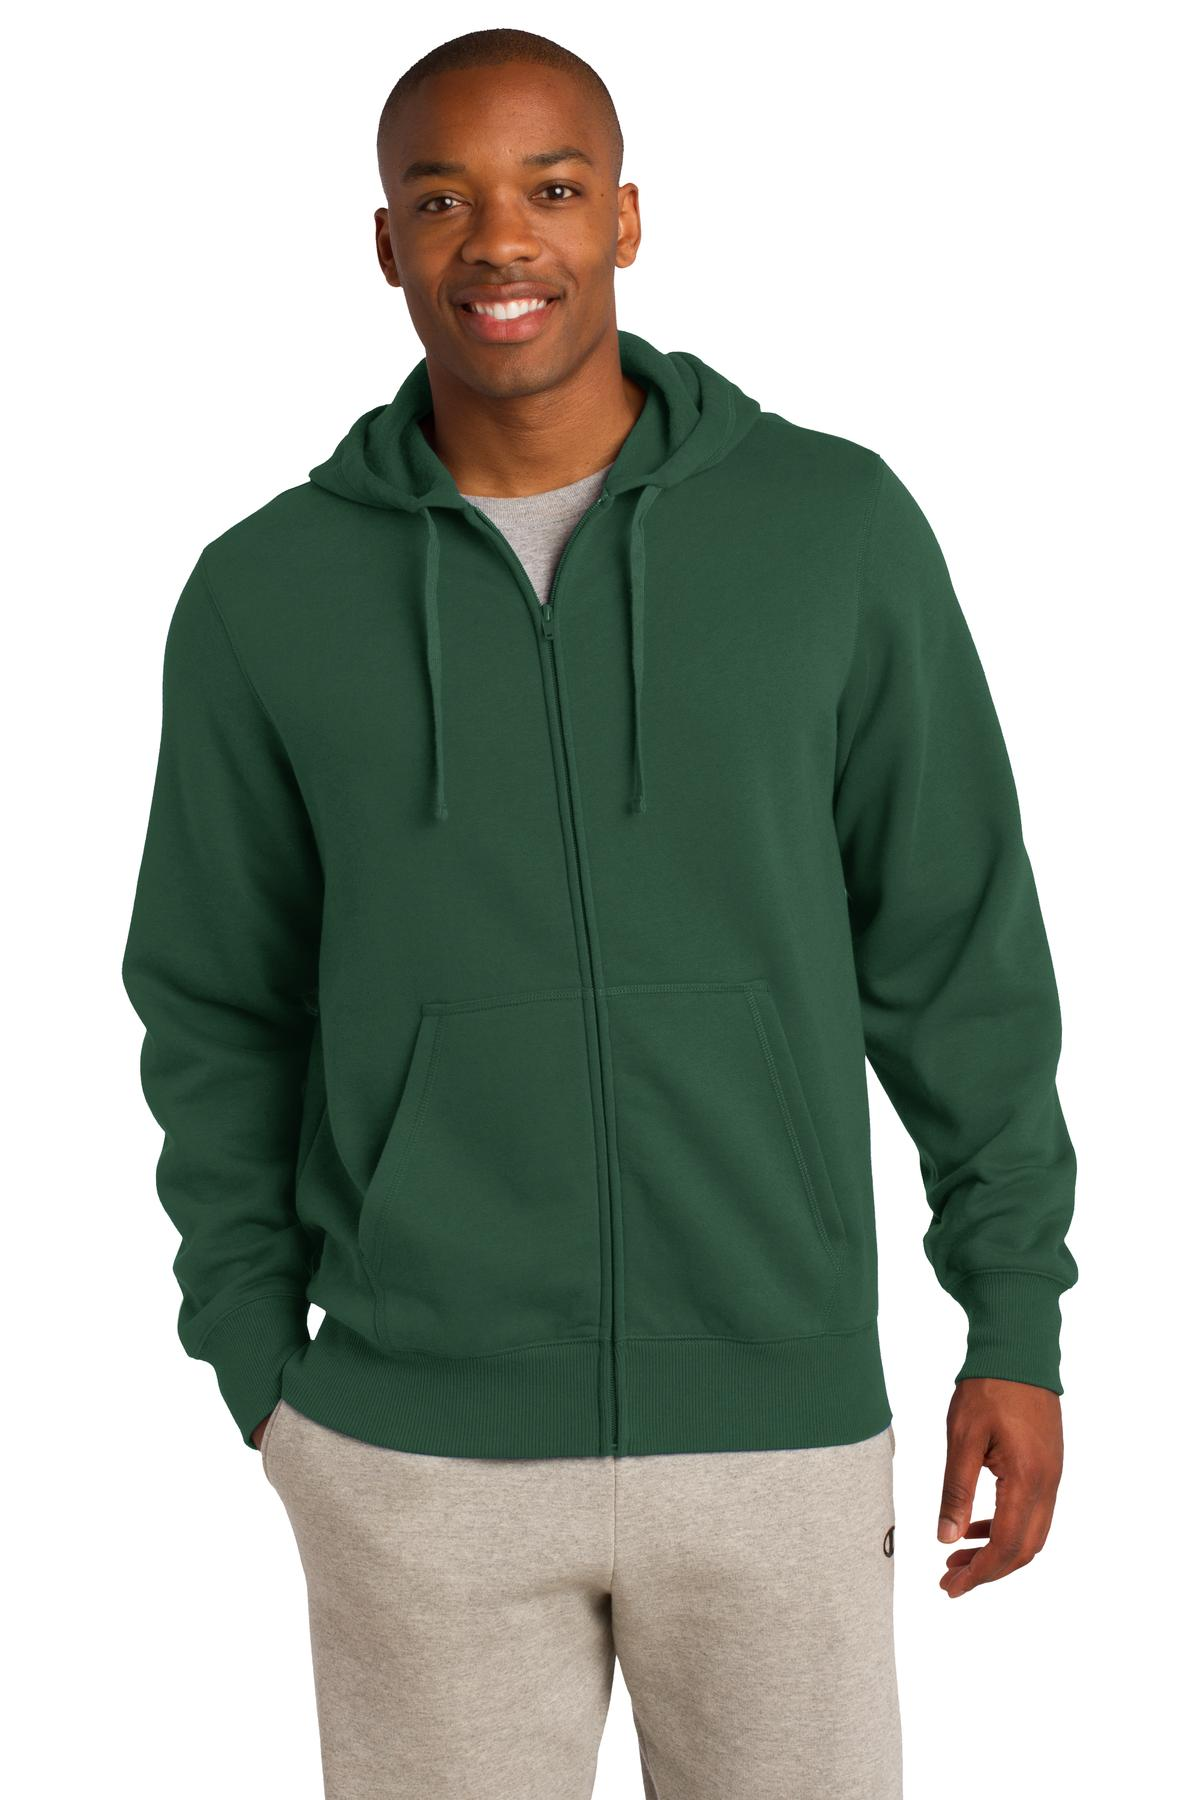 Sport-Tek® Full-Zip Hooded Sweatshirt.-Sport-Tek